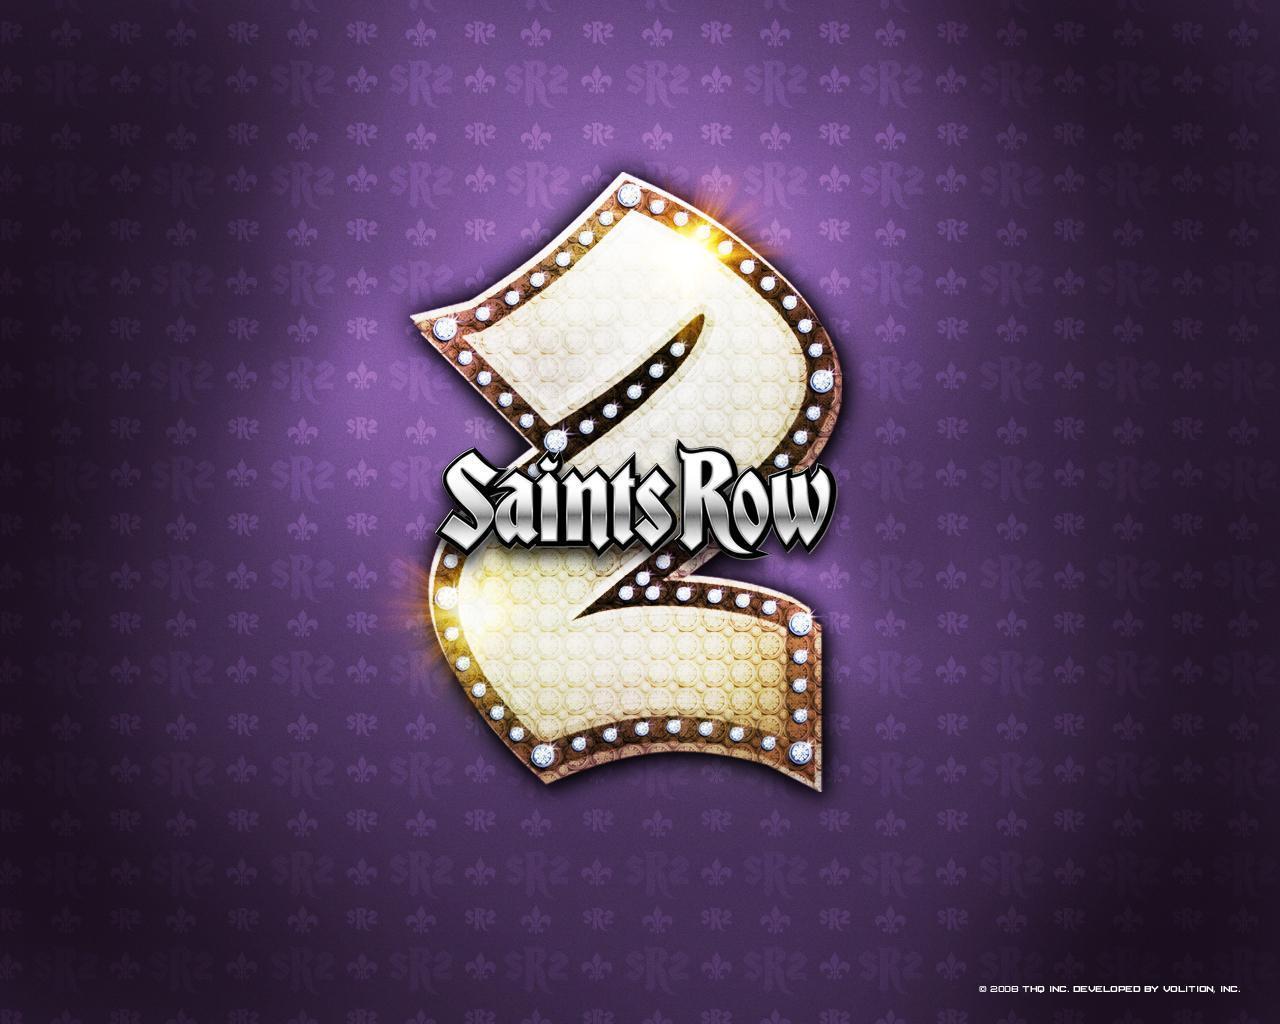 saints row 2 logo wwwpixsharkcom images galleries